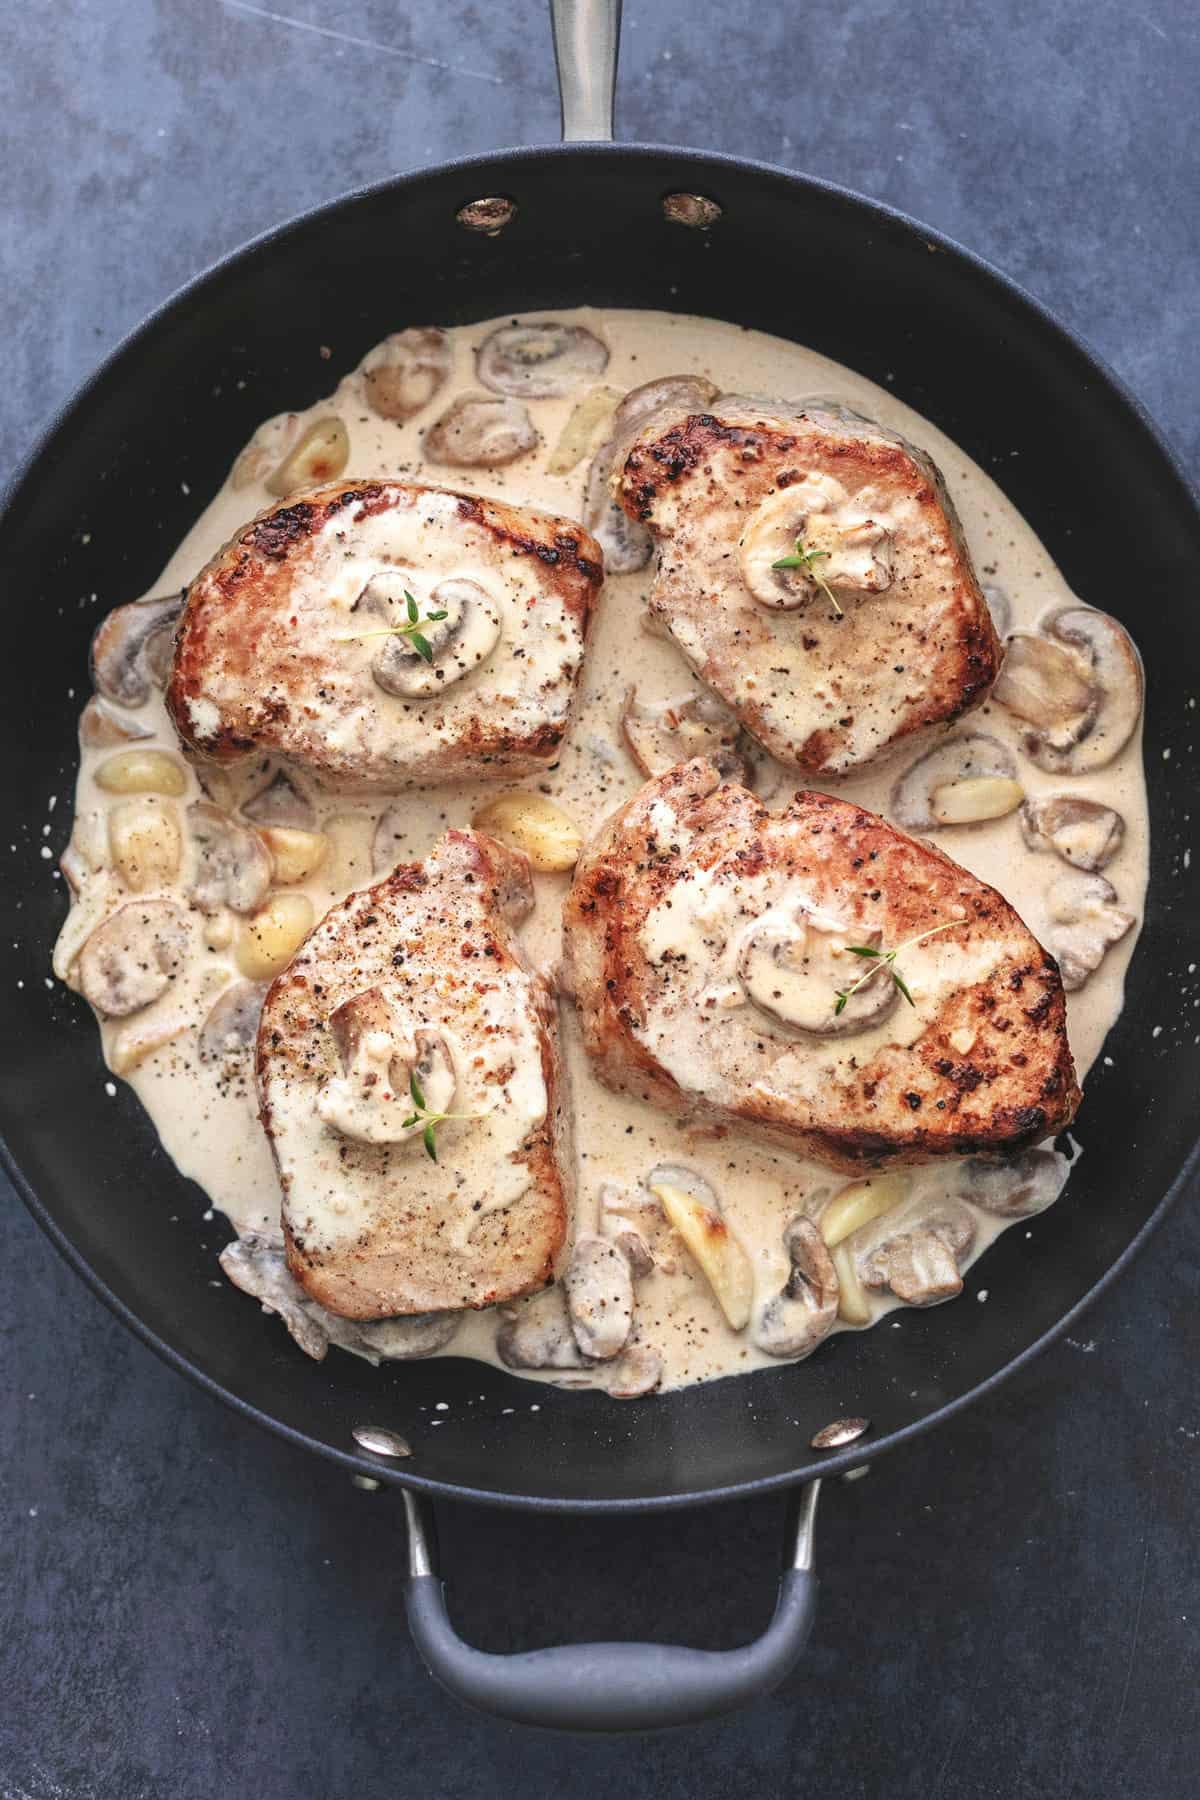 Pork Chops with Creamy Mushroom Sauce easy dinner recipe | lecremedelacrumb.com